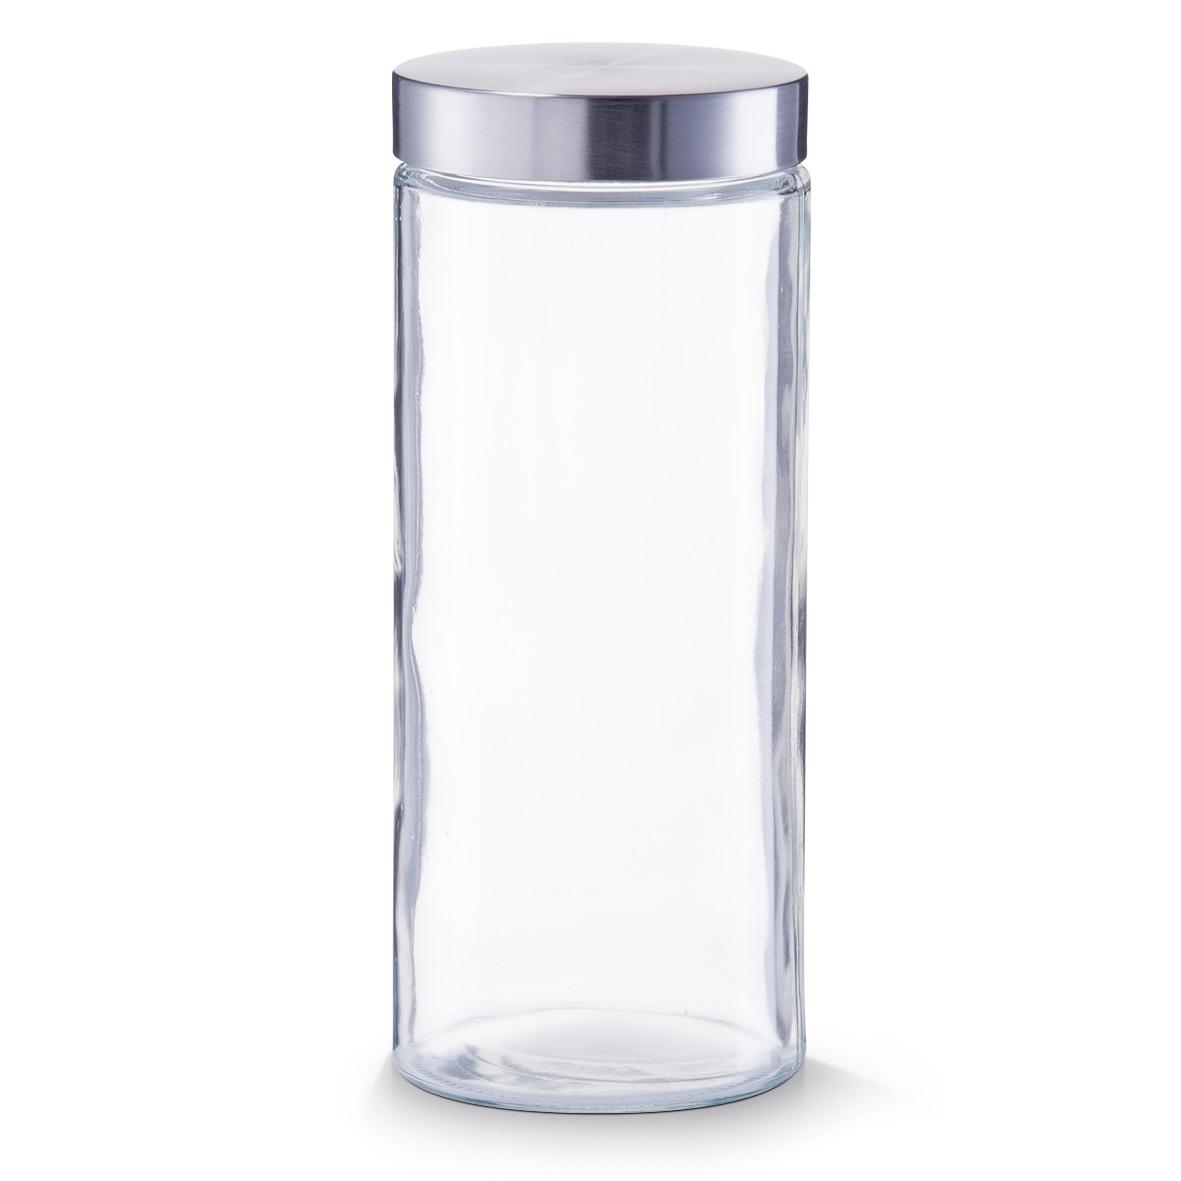 Borcan pentru depozitare, capac inox, Glass 2100 ml, Ø 11xH27 cm poza